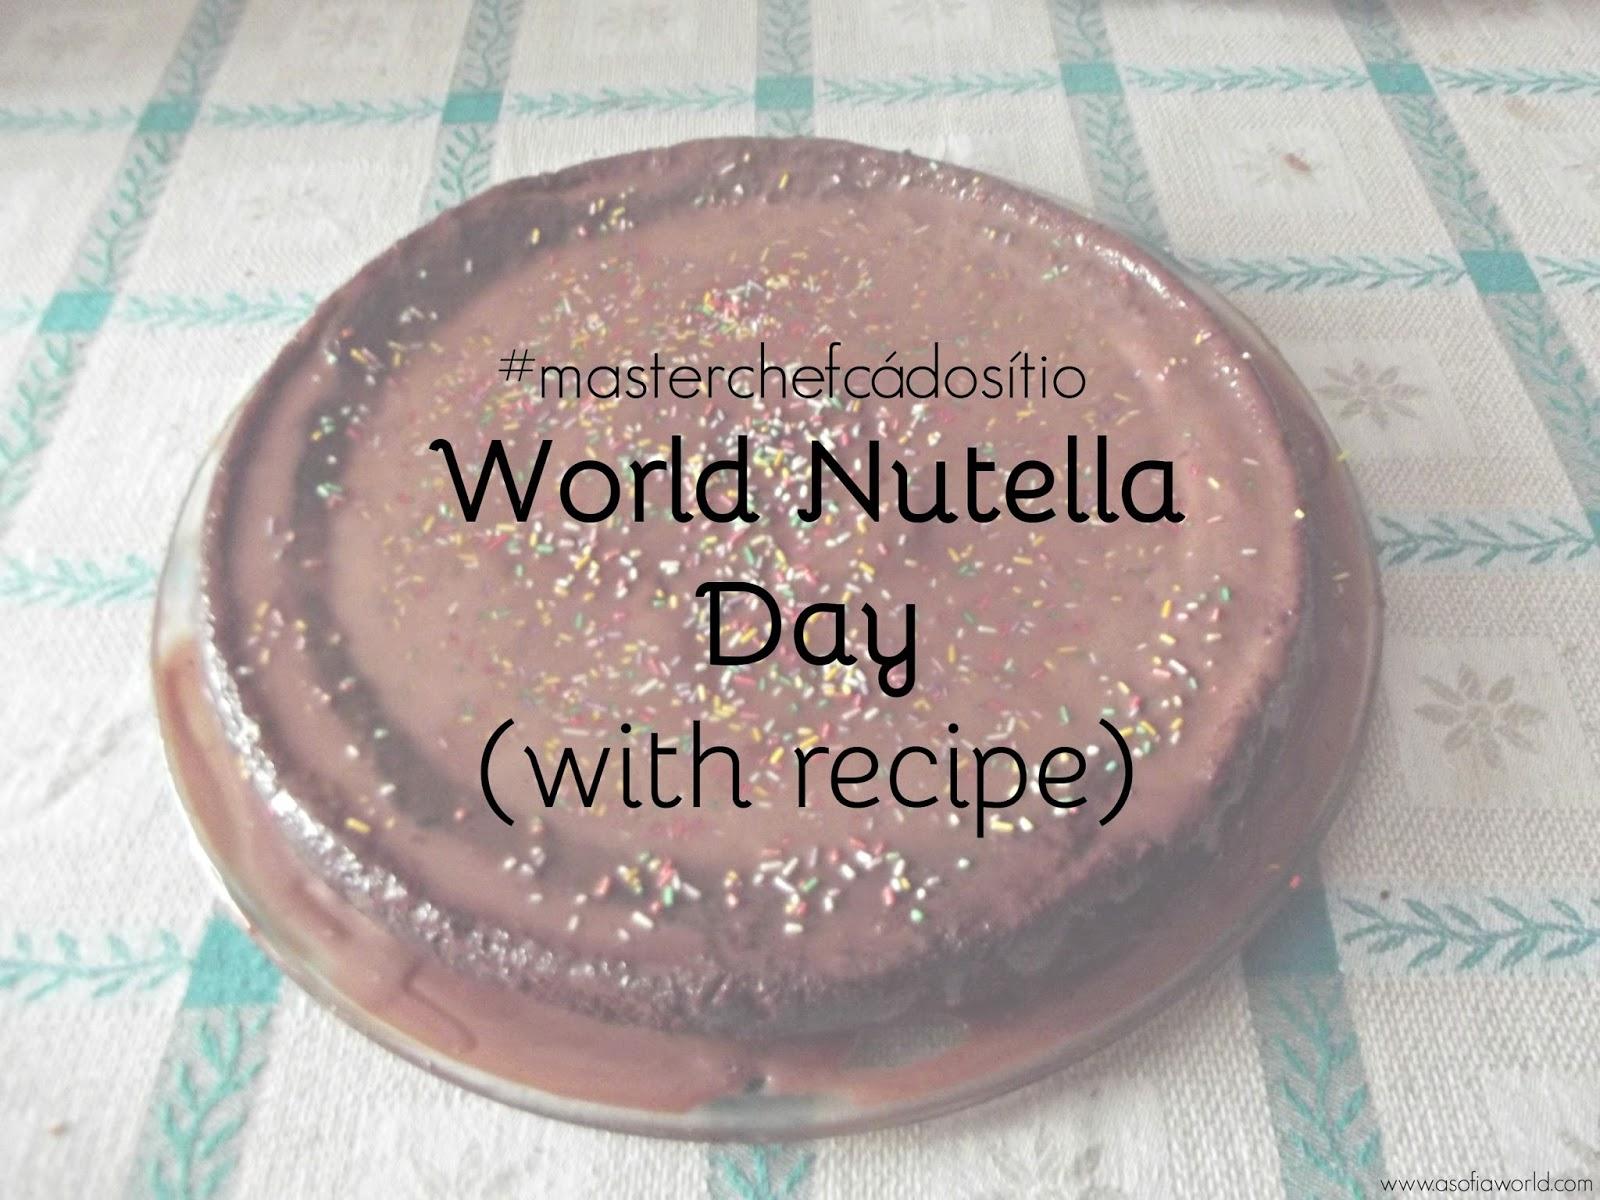 World Nutella Day Chocolate Cake Recipe with Nutella